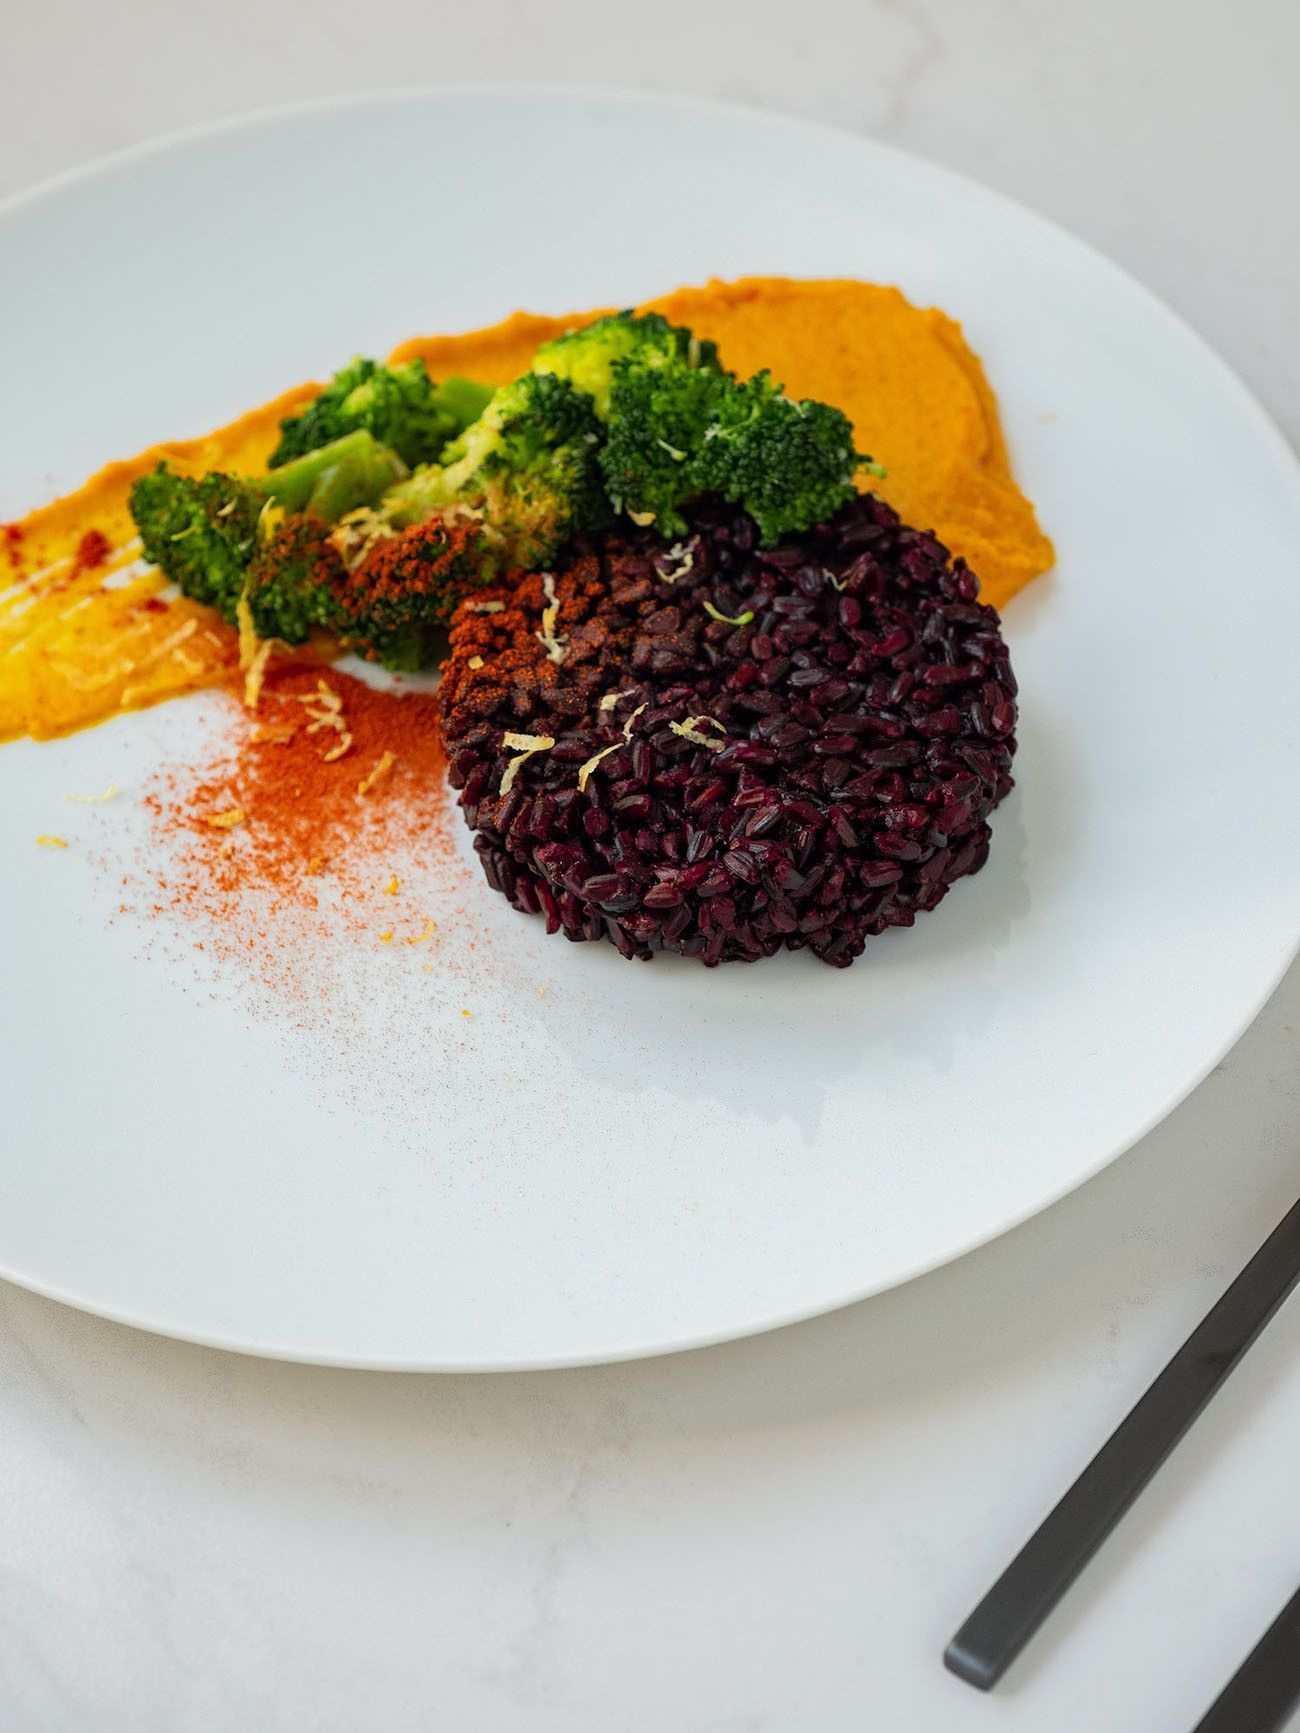 Foodblog, Rezept Kürbis Curry Püree mit zitronen Brokkoli und schwarzem Reis, Paprikapulver, Hokkaido_1